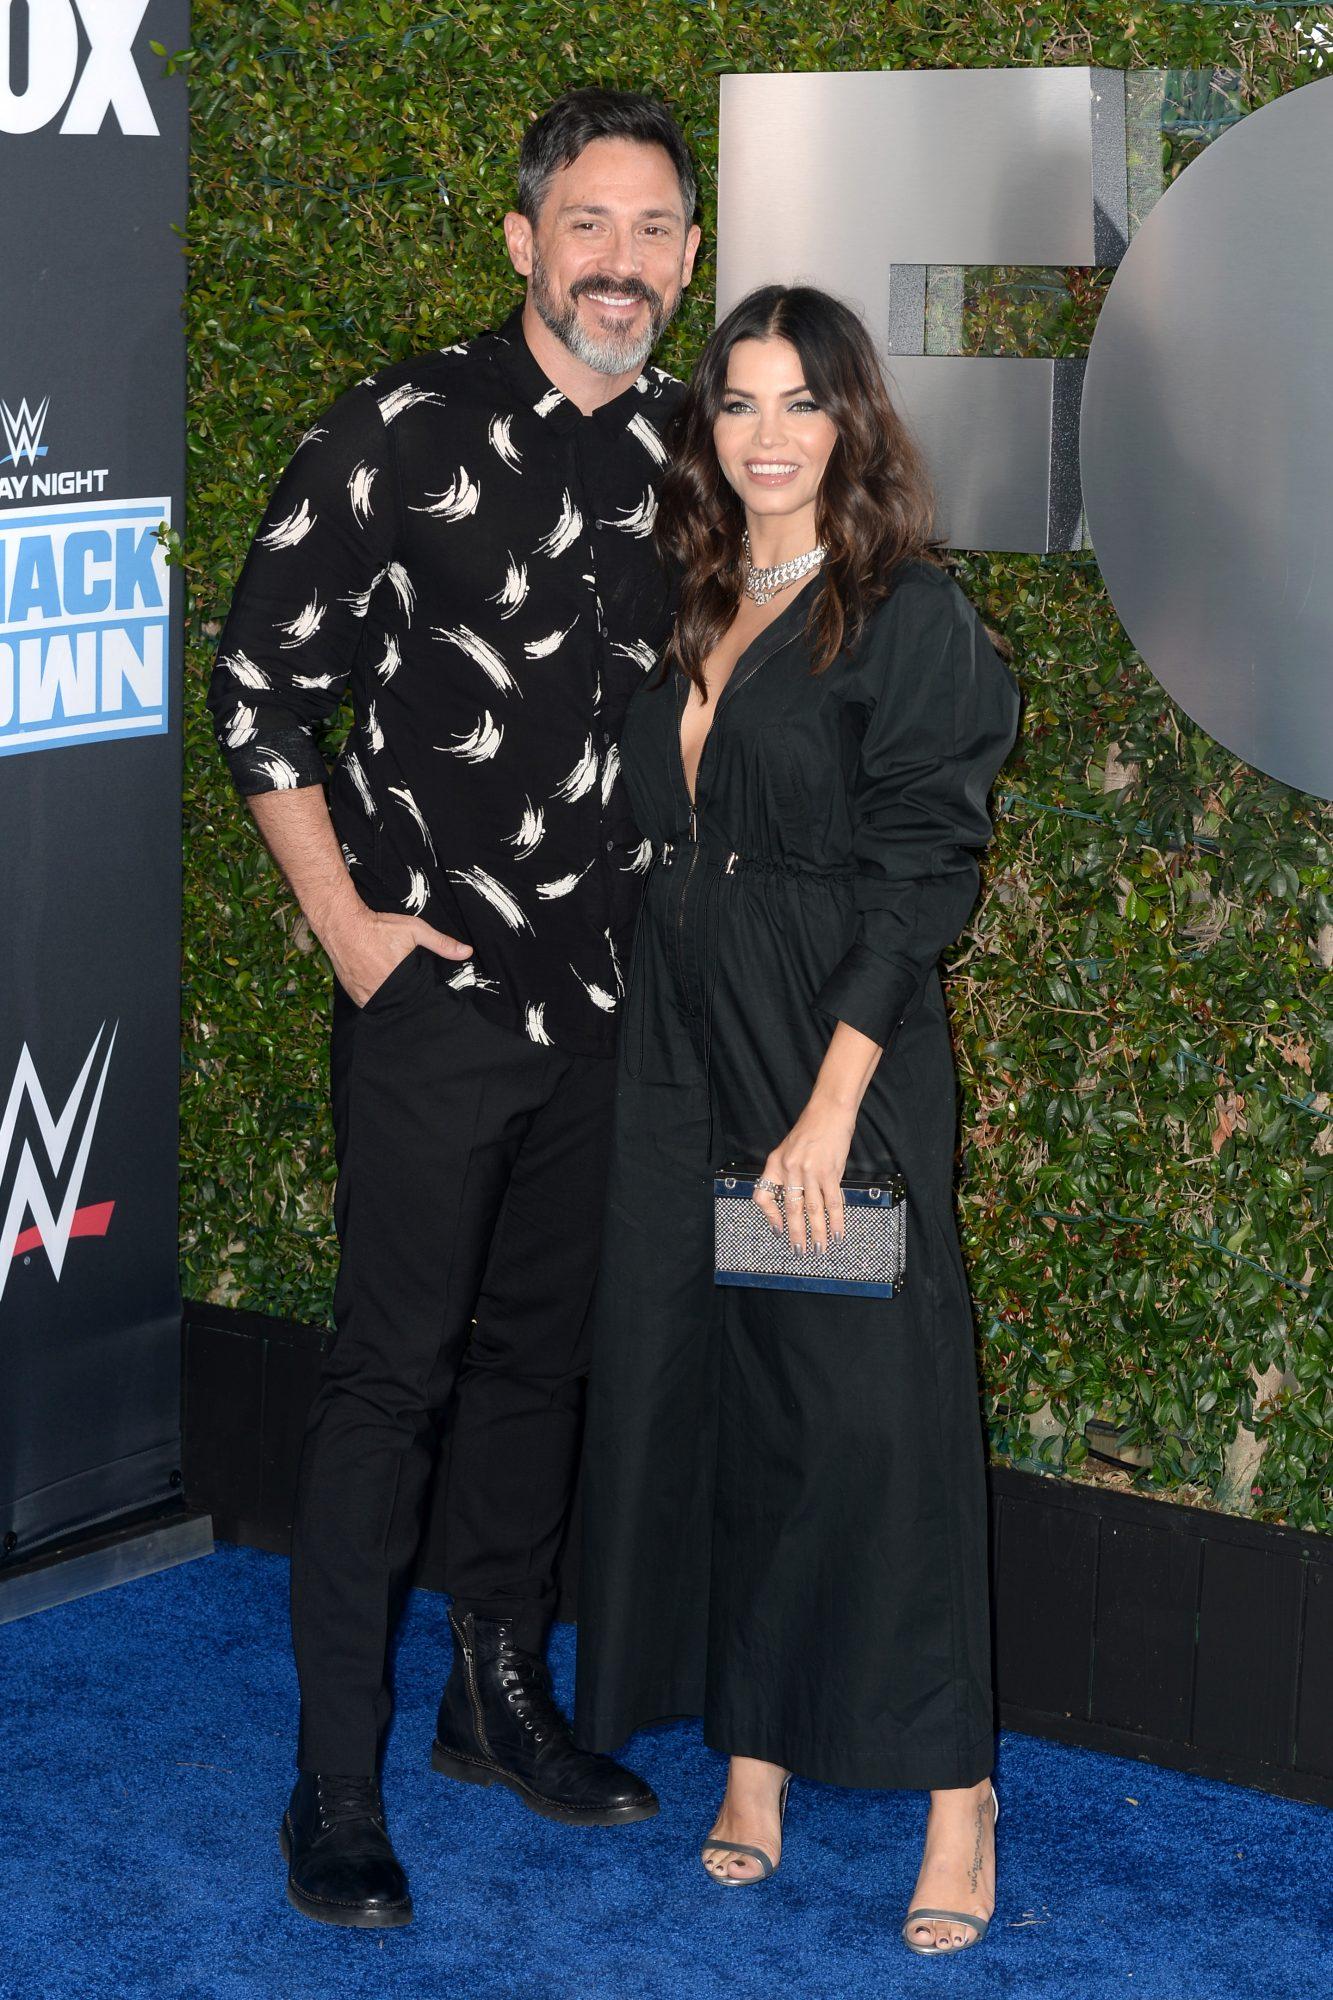 Jenna Dewan Is Engaged to Her Boyfriend, Steve Kazee!